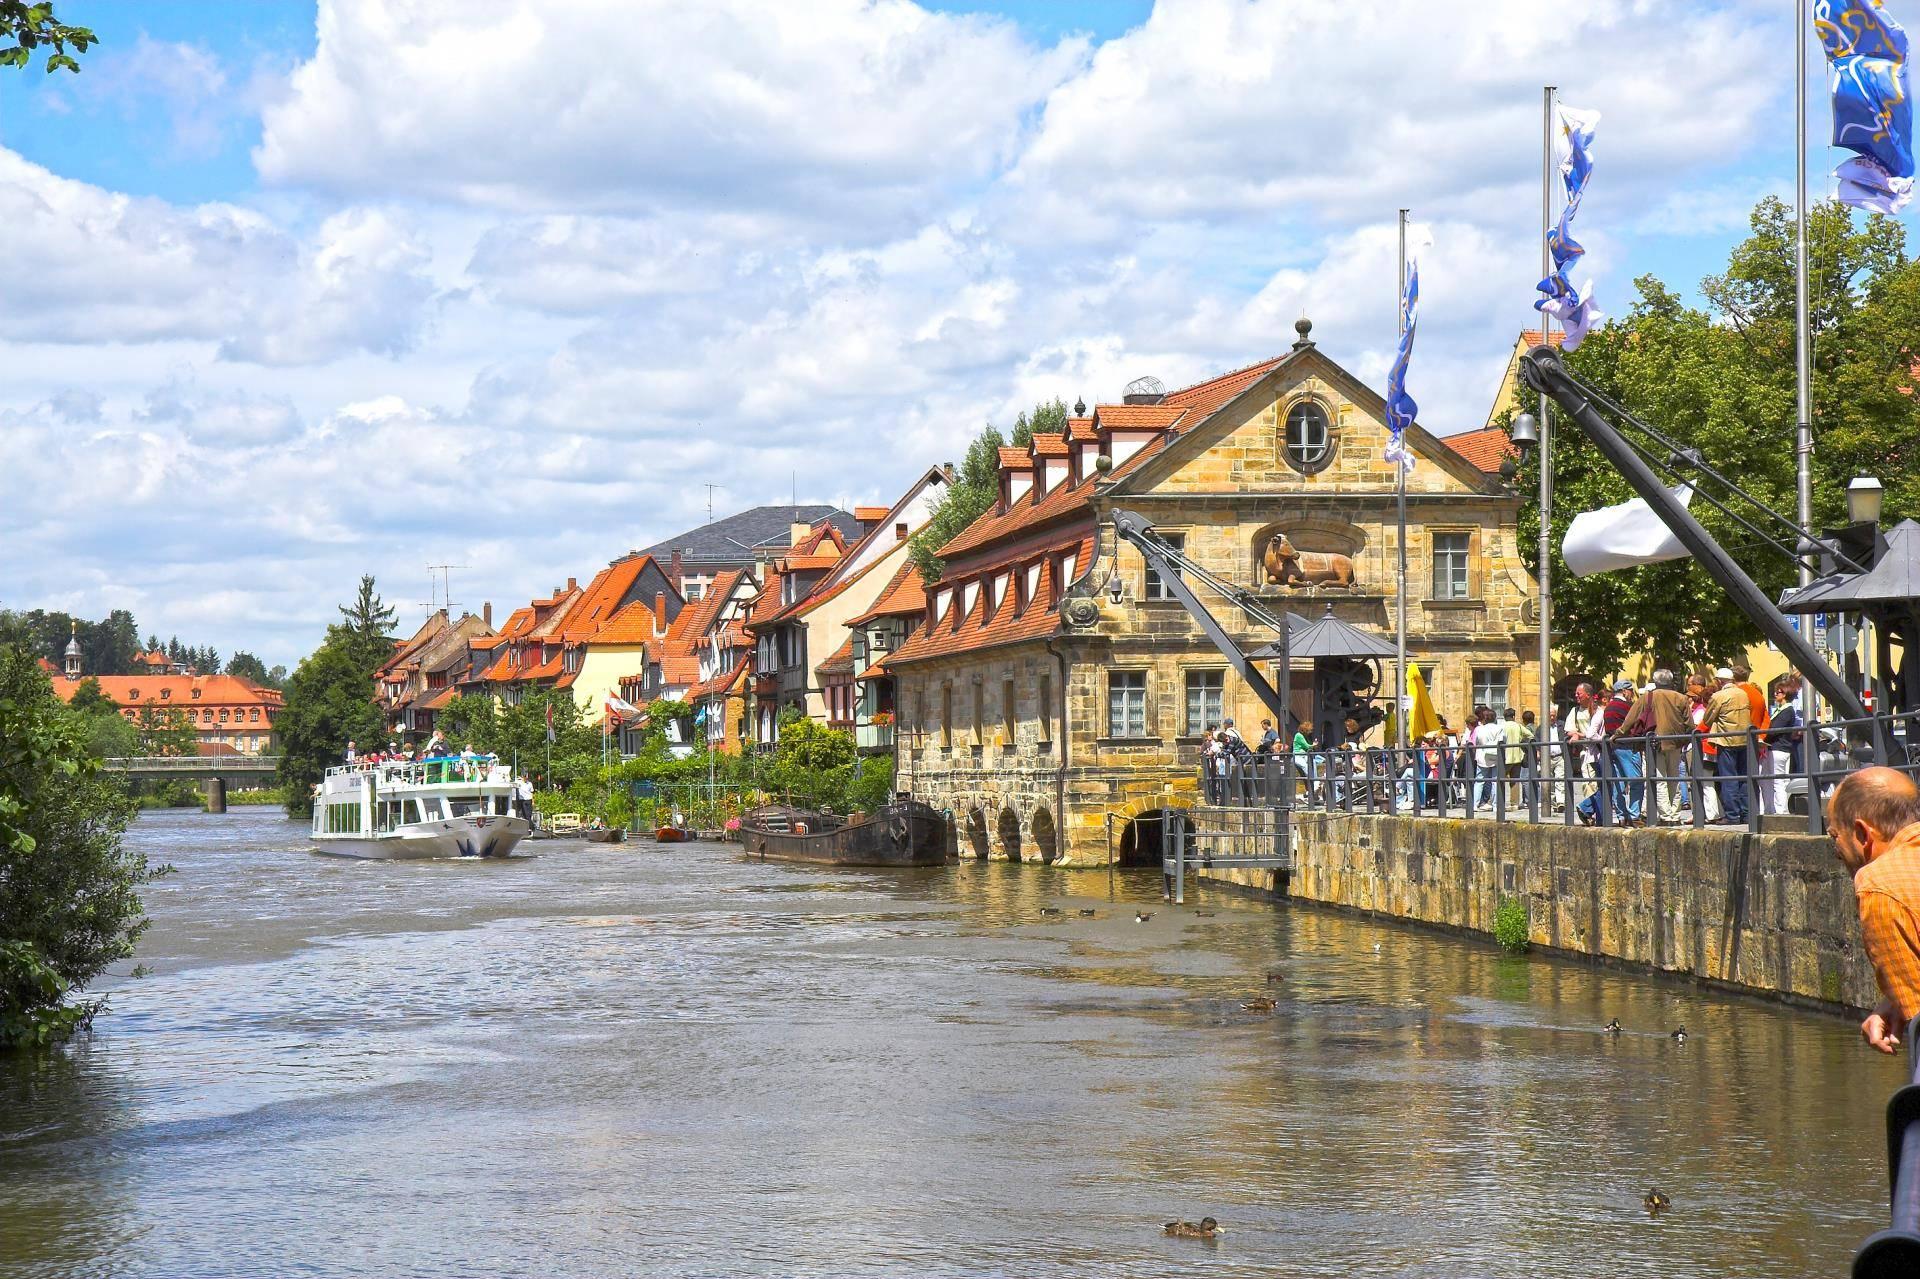 Flusskreuzfahrt: Rhein-Main-Donau